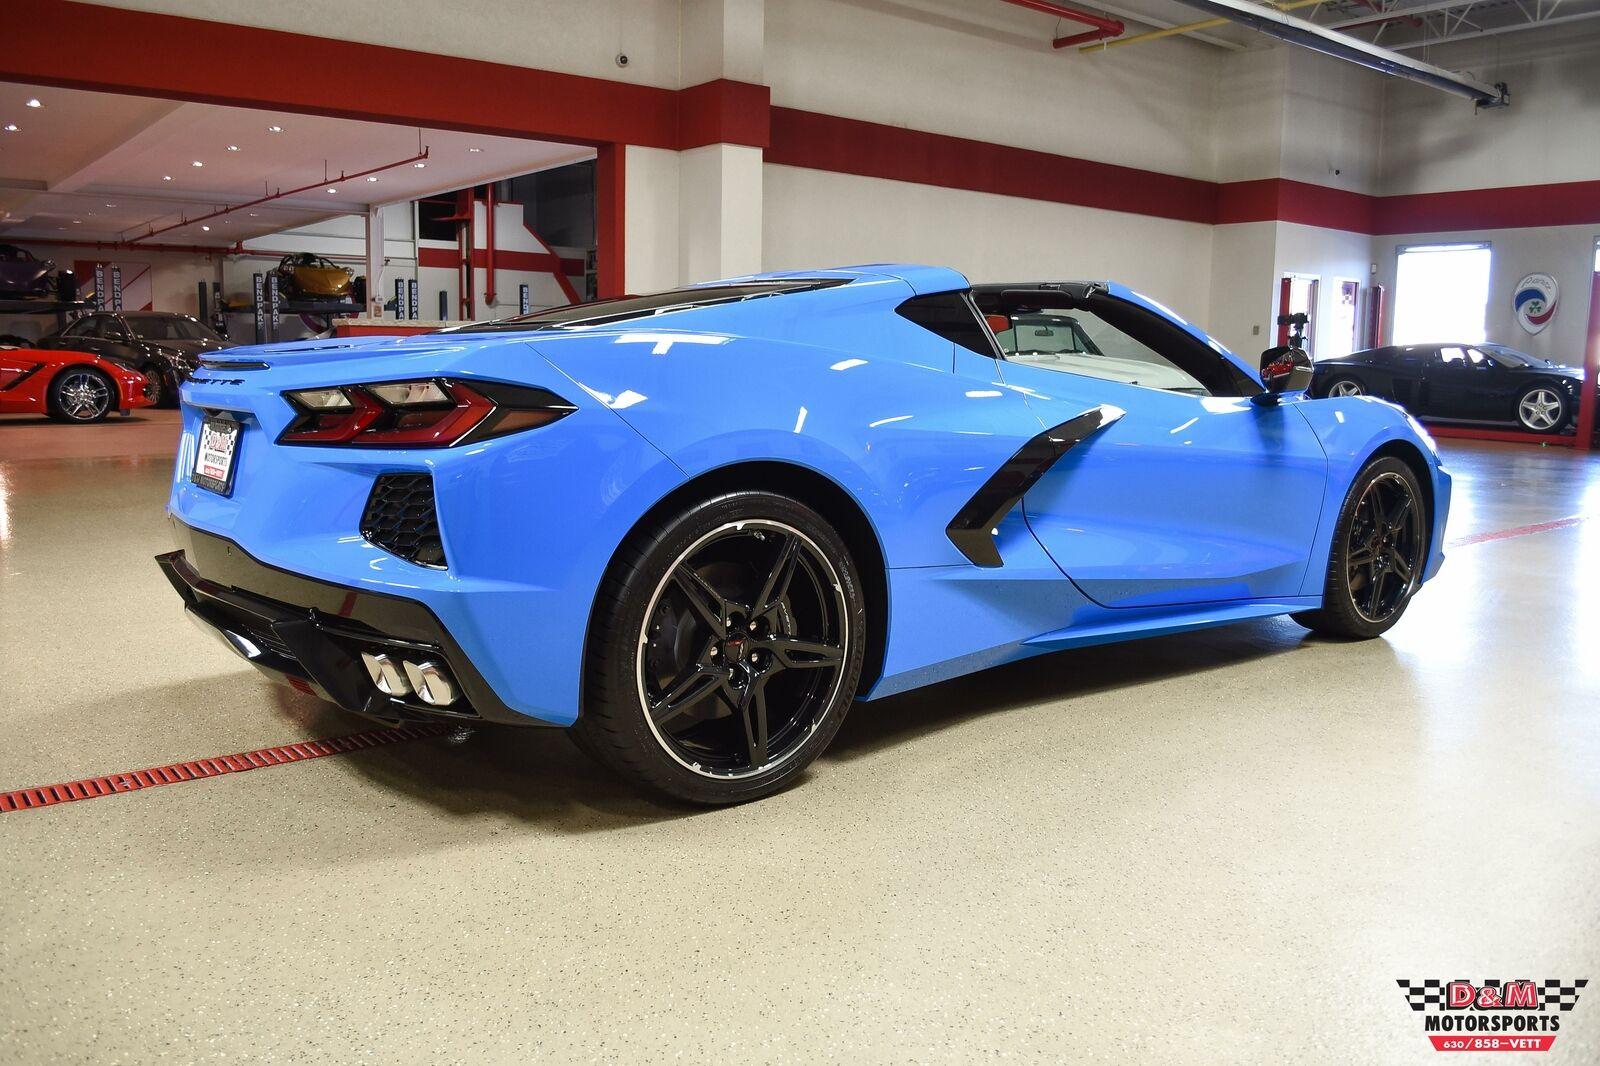 2020 Blue Chevrolet Corvette Stingray  | C7 Corvette Photo 6